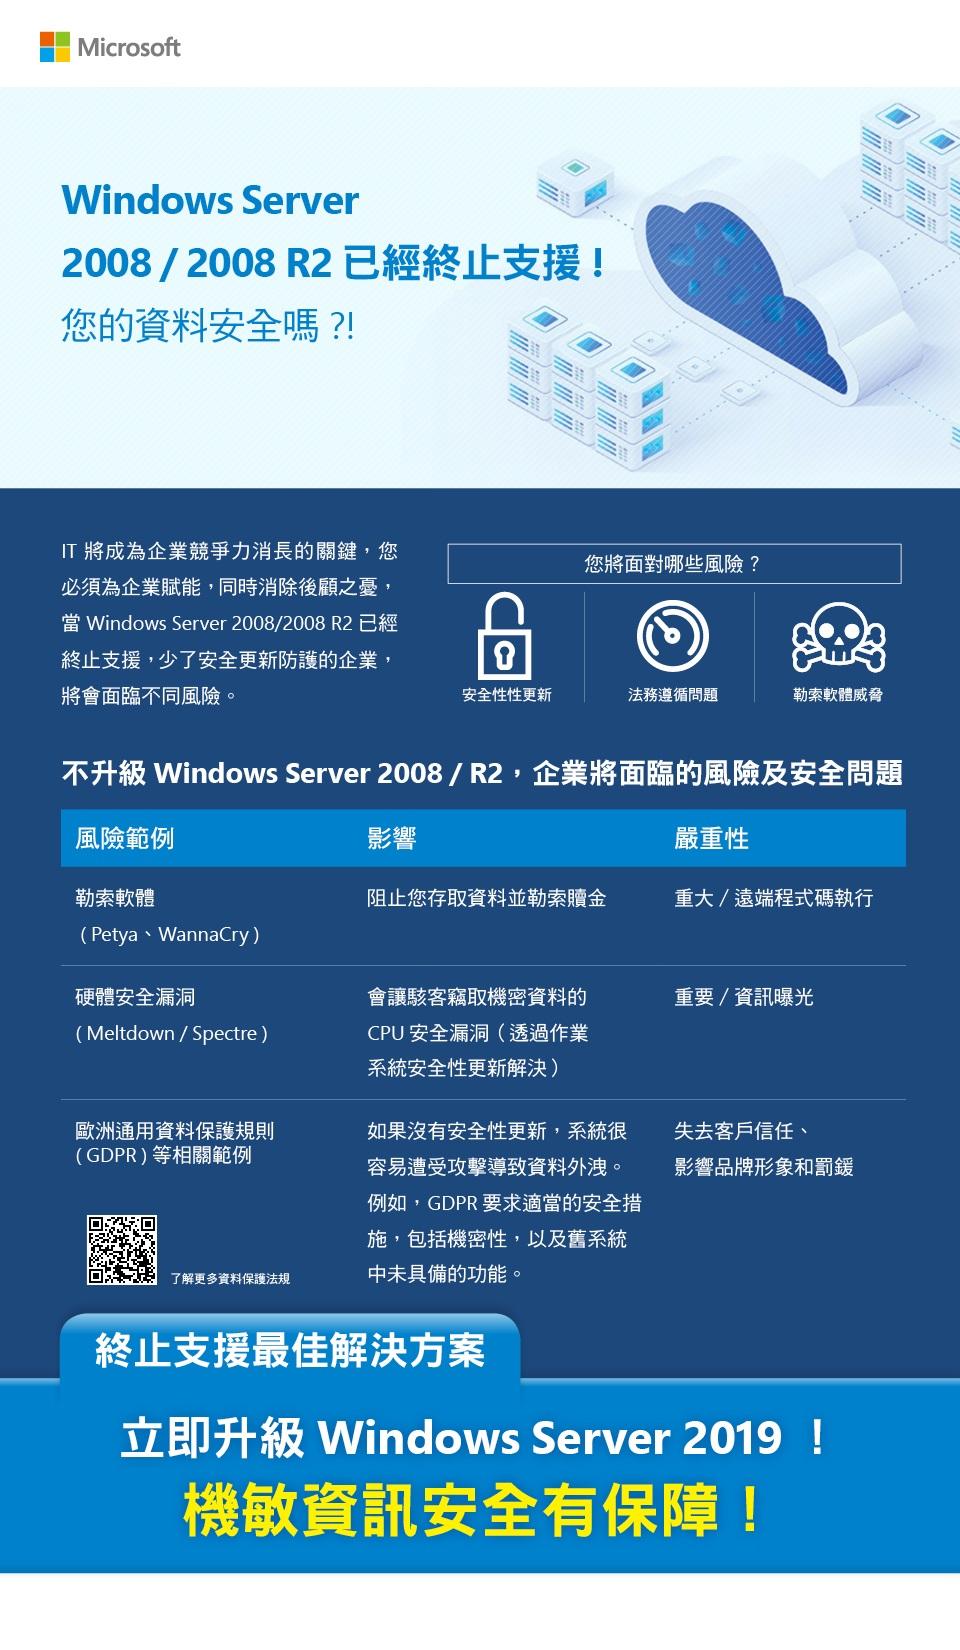 Windows Server 2019 - Windows Server 2008 & 2008R2停止支援